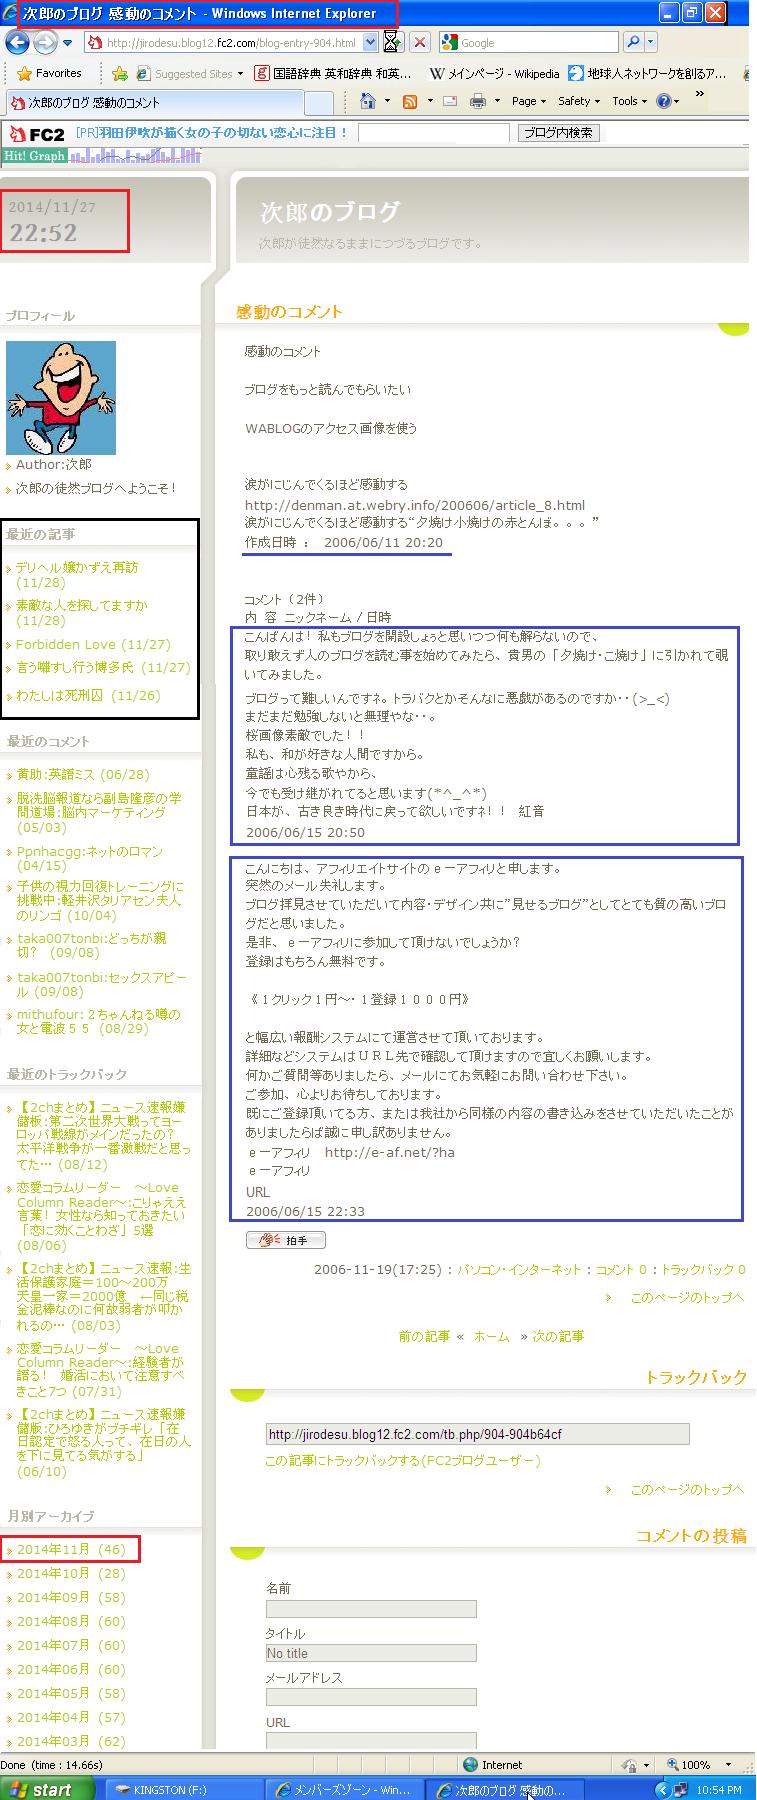 Wikipedia:井戸端/subj/出典の適格性